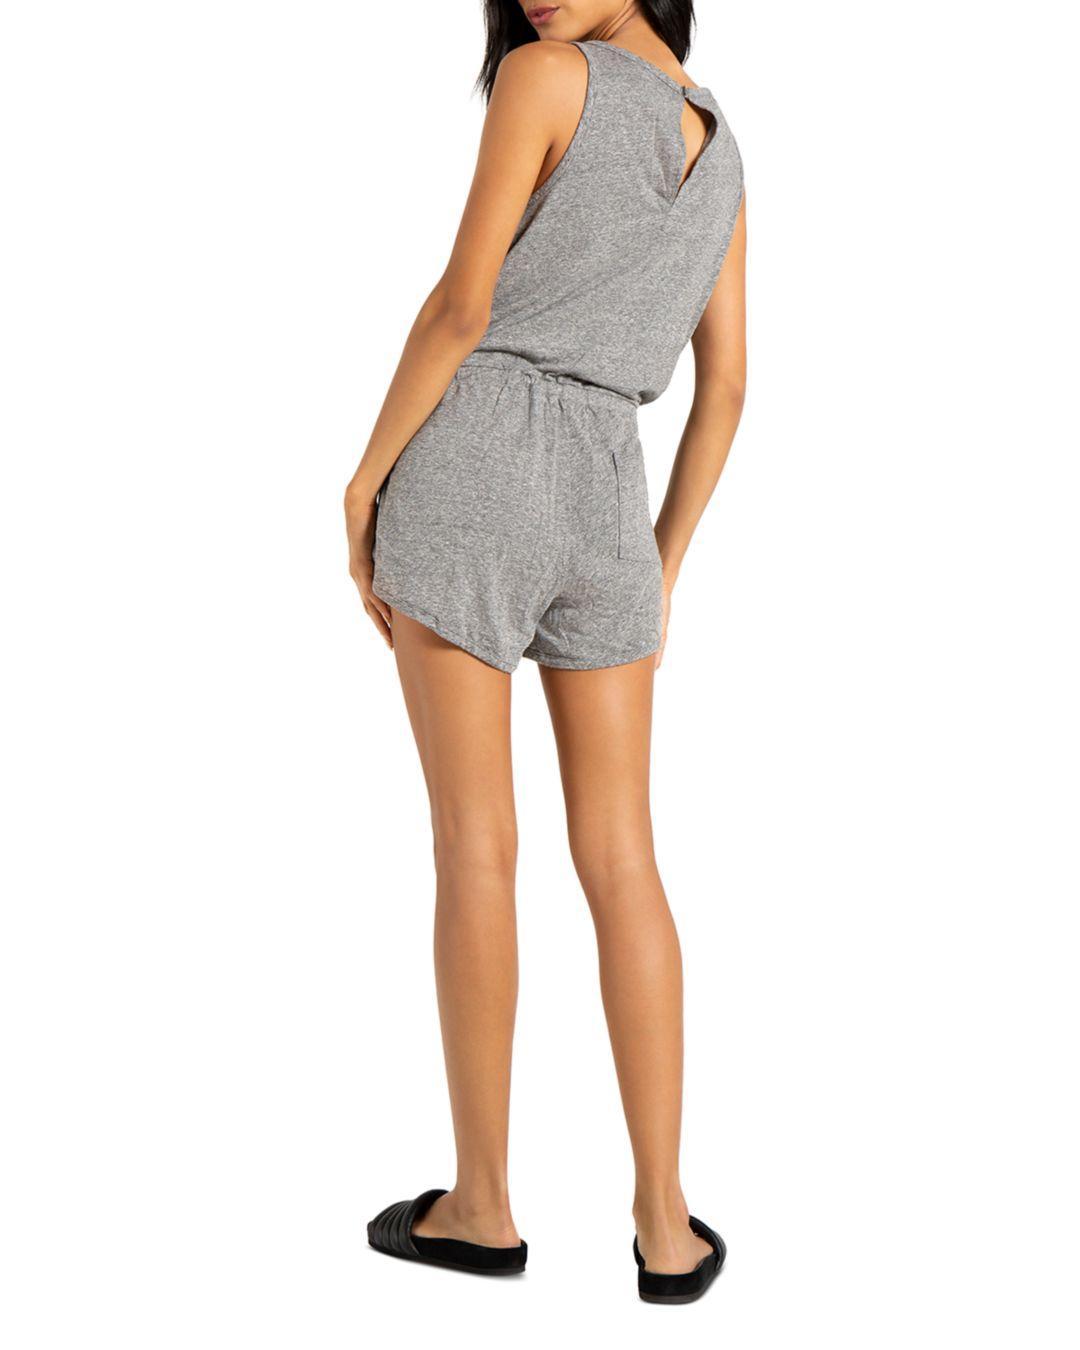 Spke85svest Straight Outta Timeout Womens Basic Tank Tops Sleeveless Graphic Print Shirt Tee